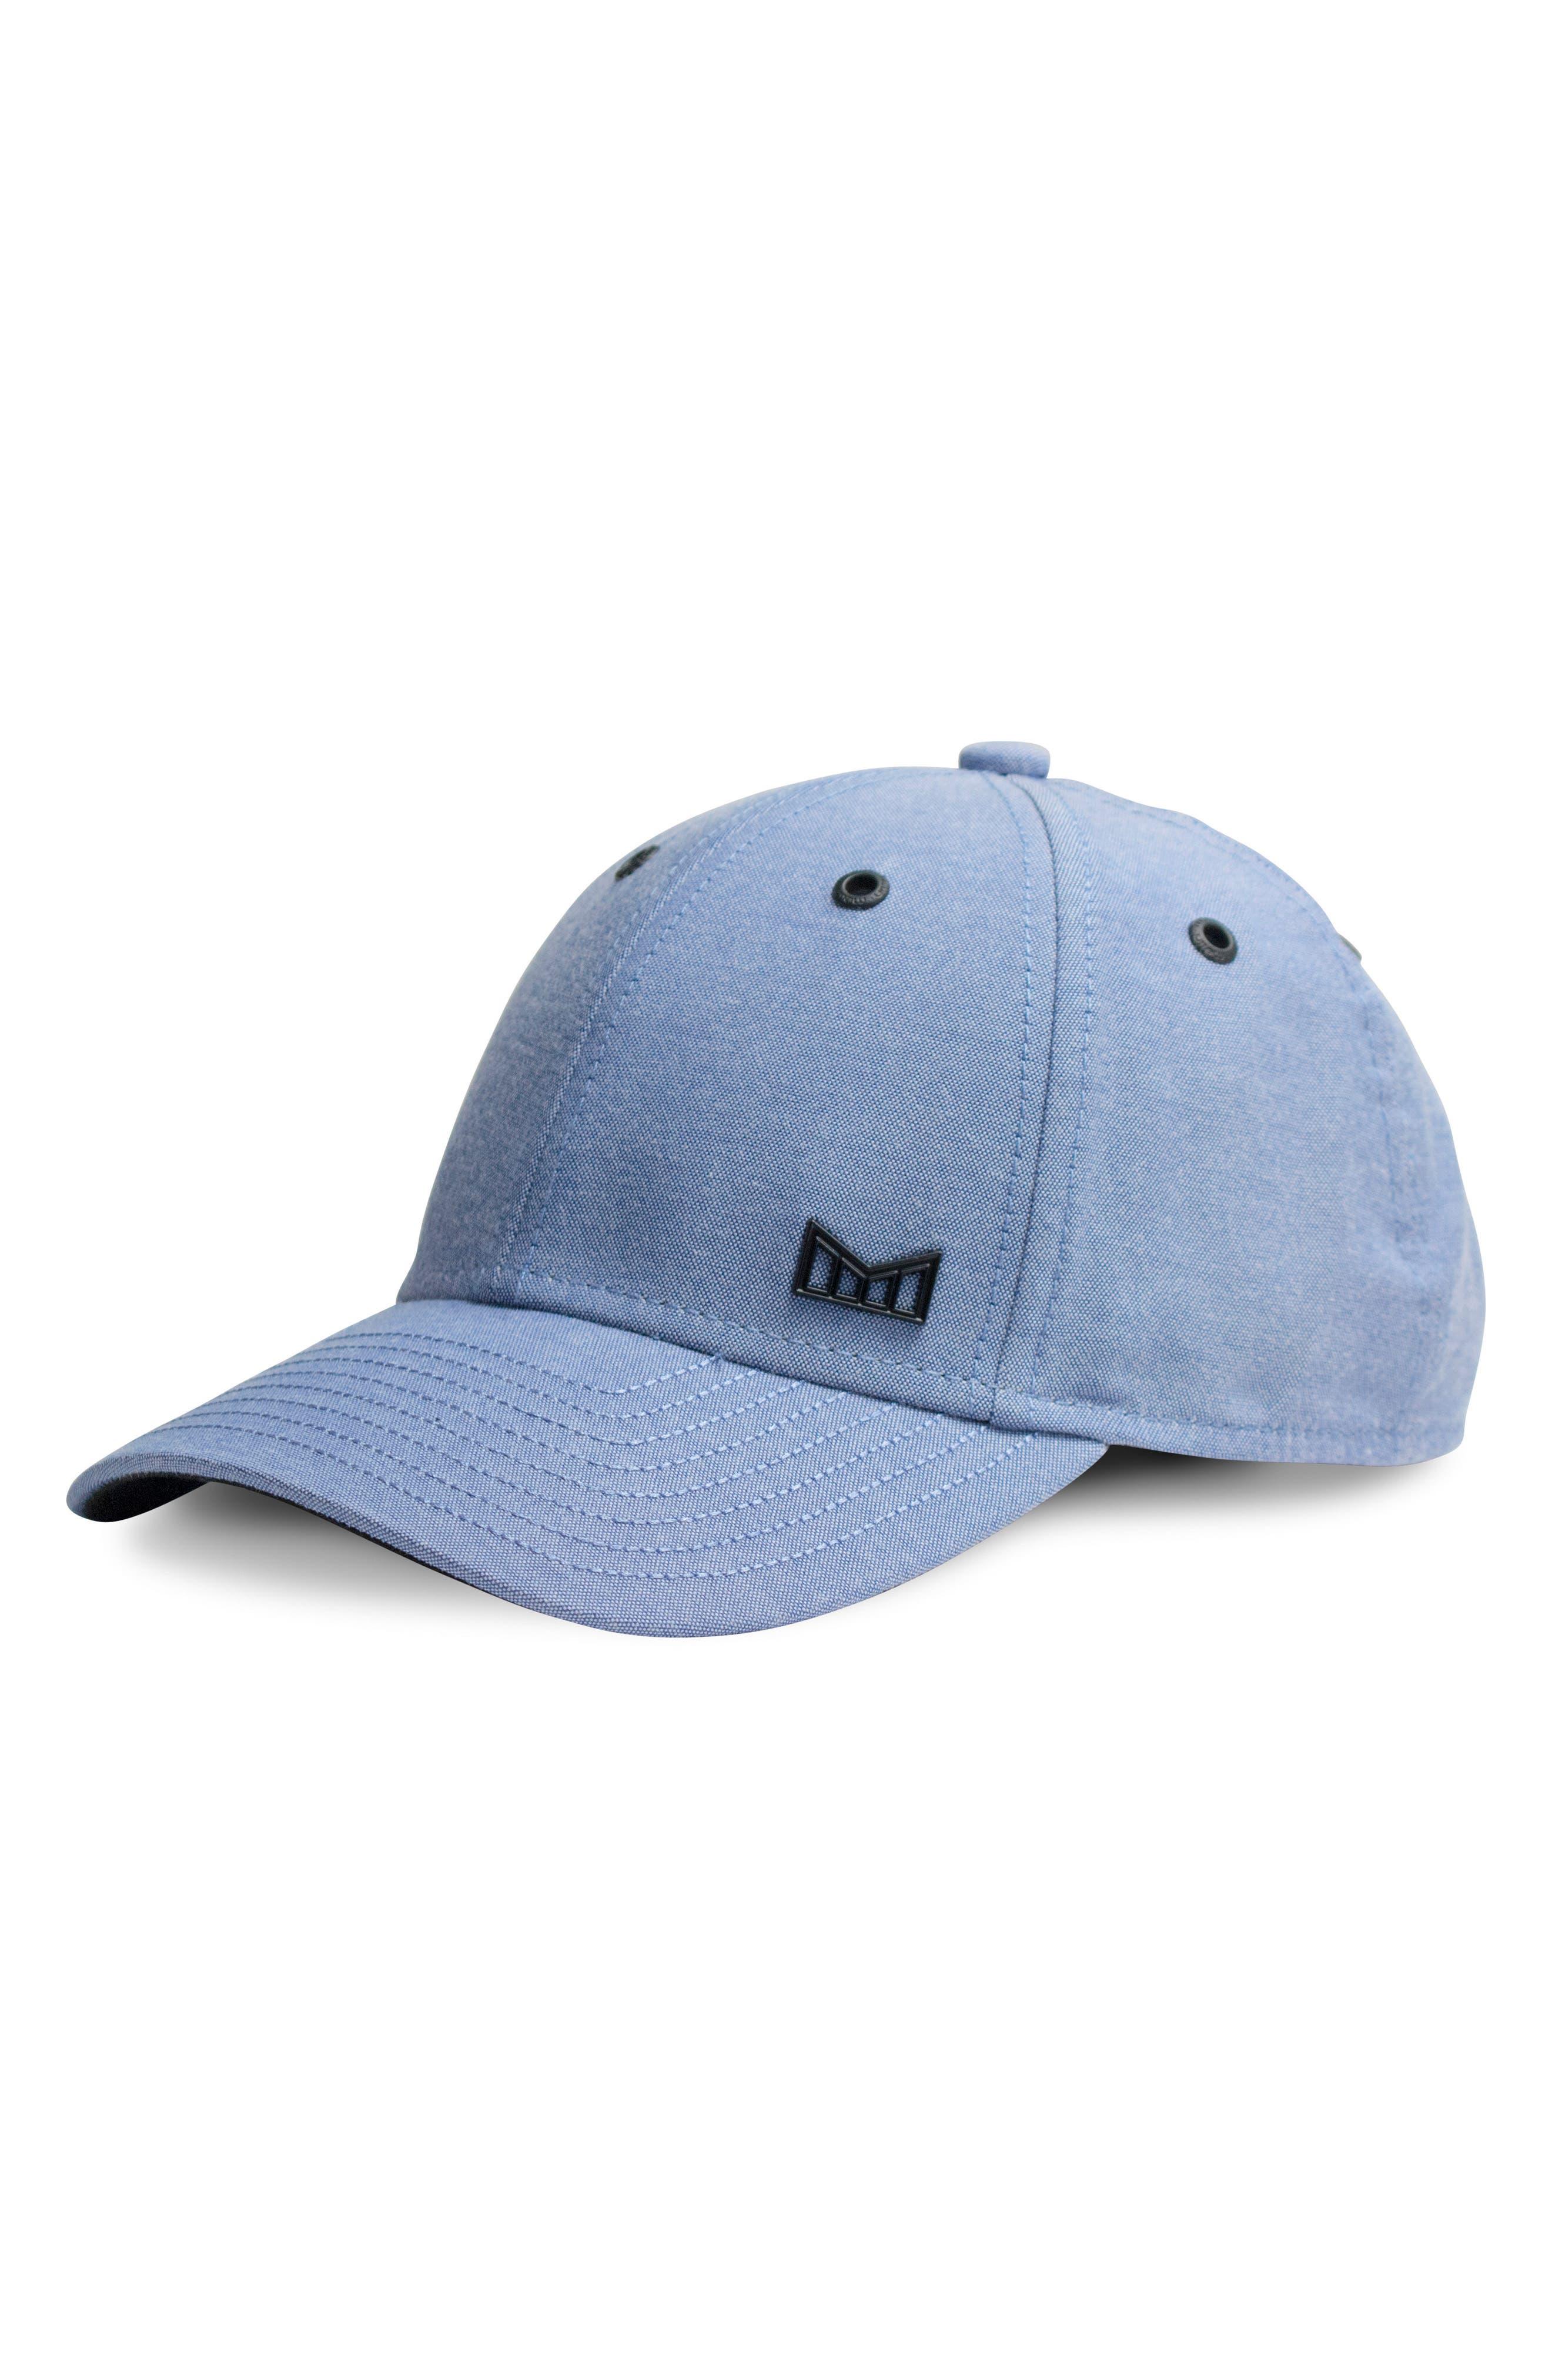 Melin Scholar Snapback Baseball Cap